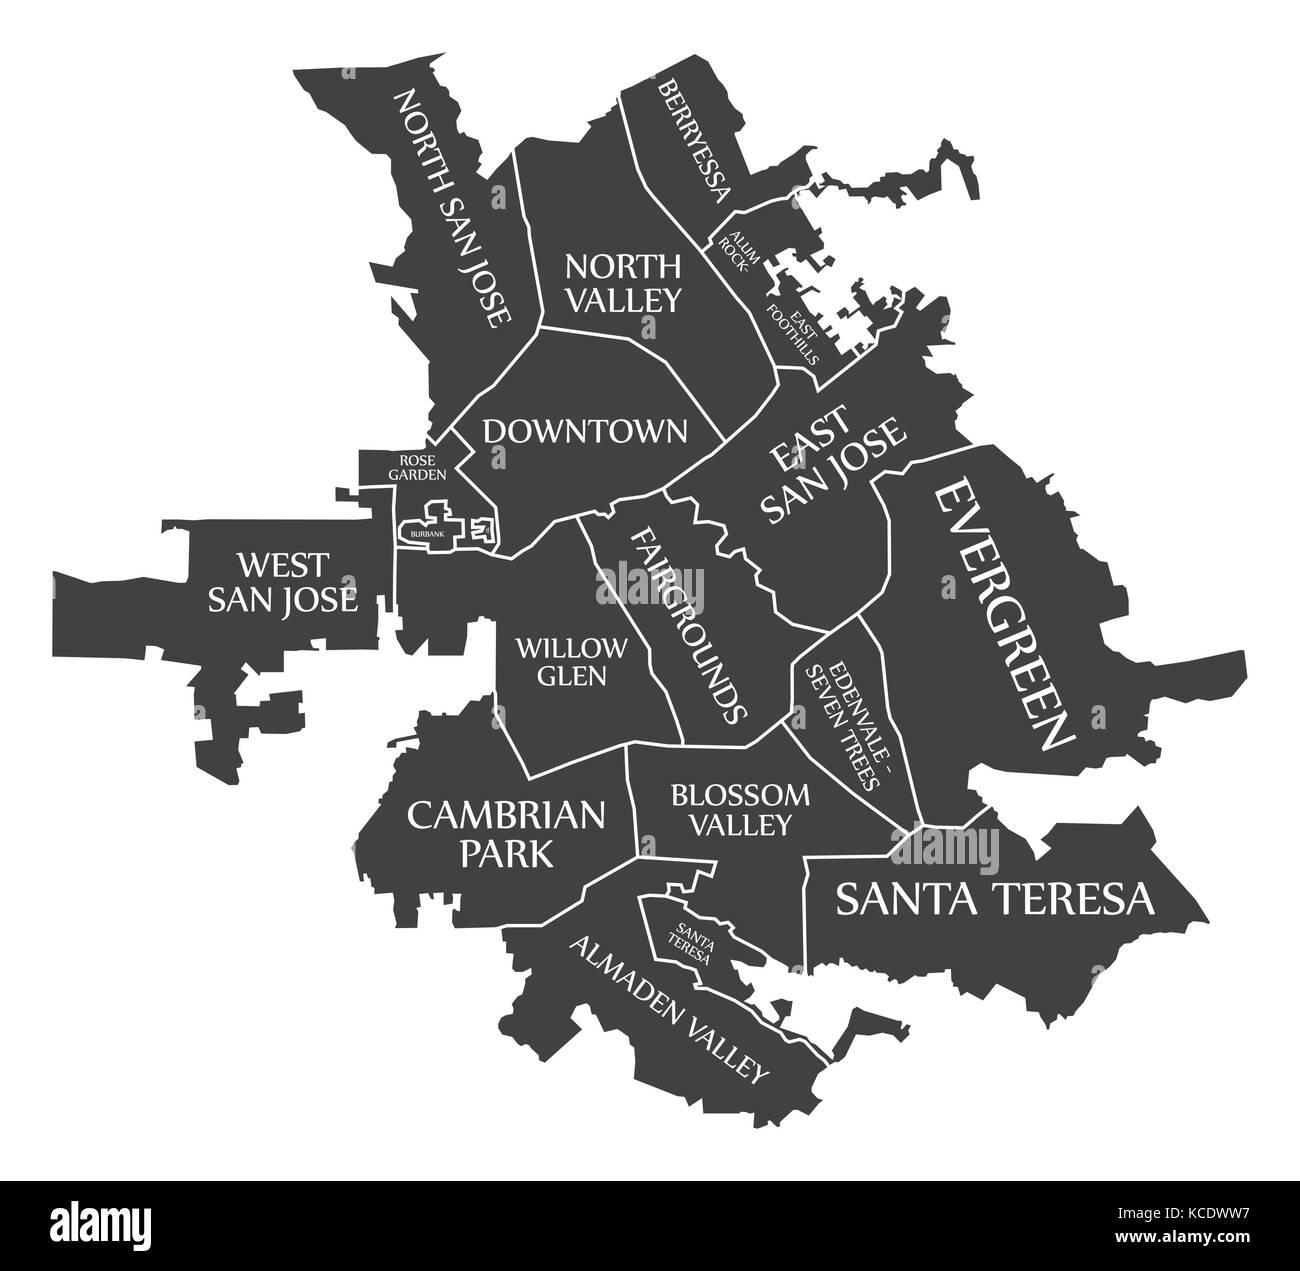 san jose california city map usa labelled black illustration